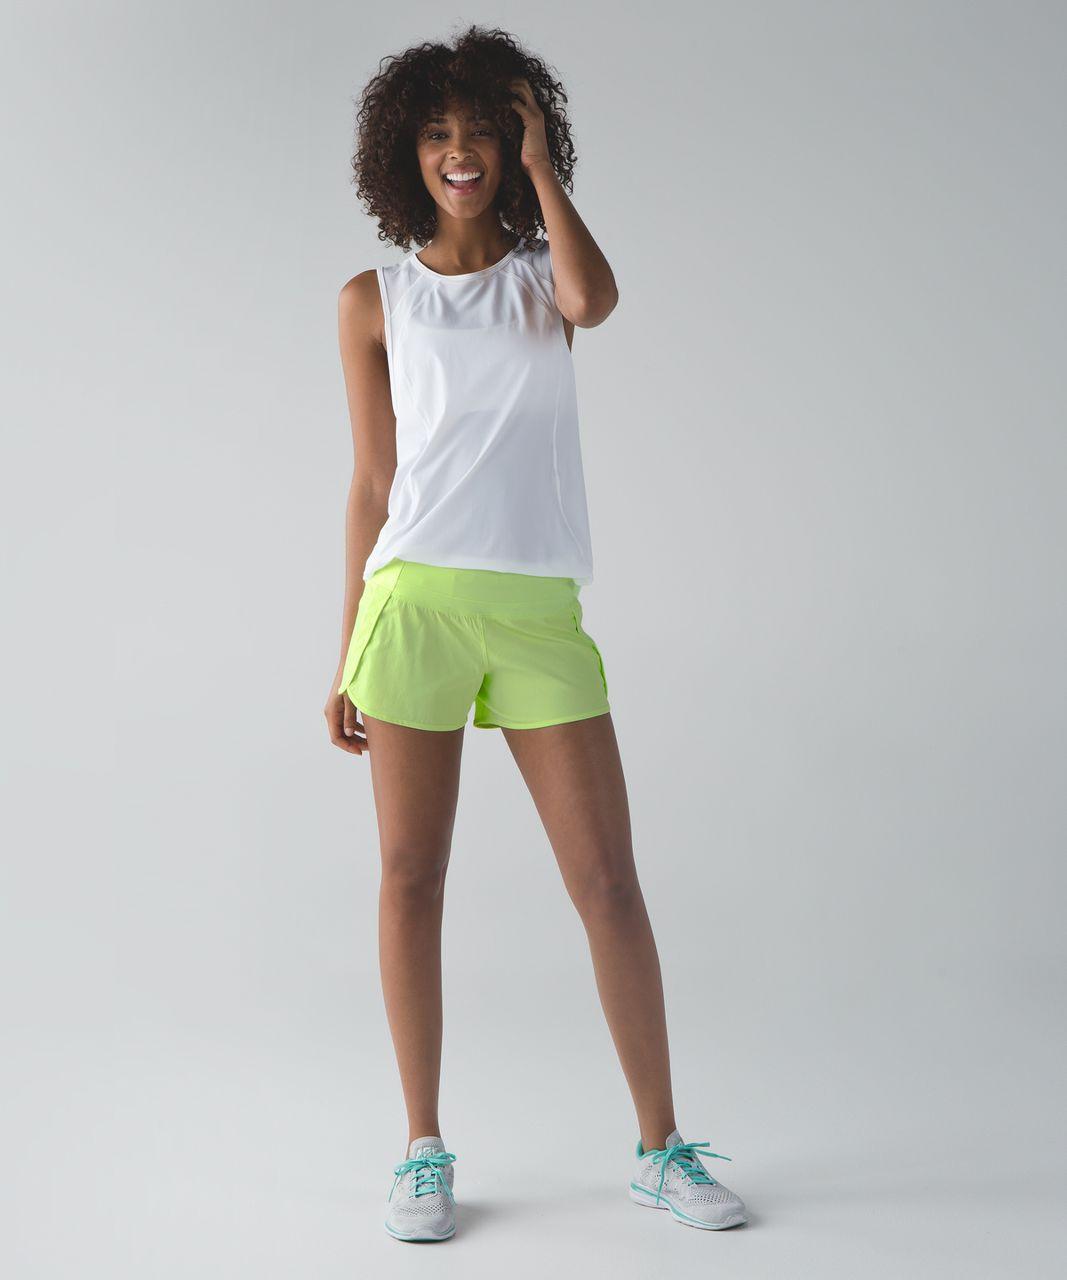 Lululemon Run Times Short (4-way Stretch) - Clear Mint